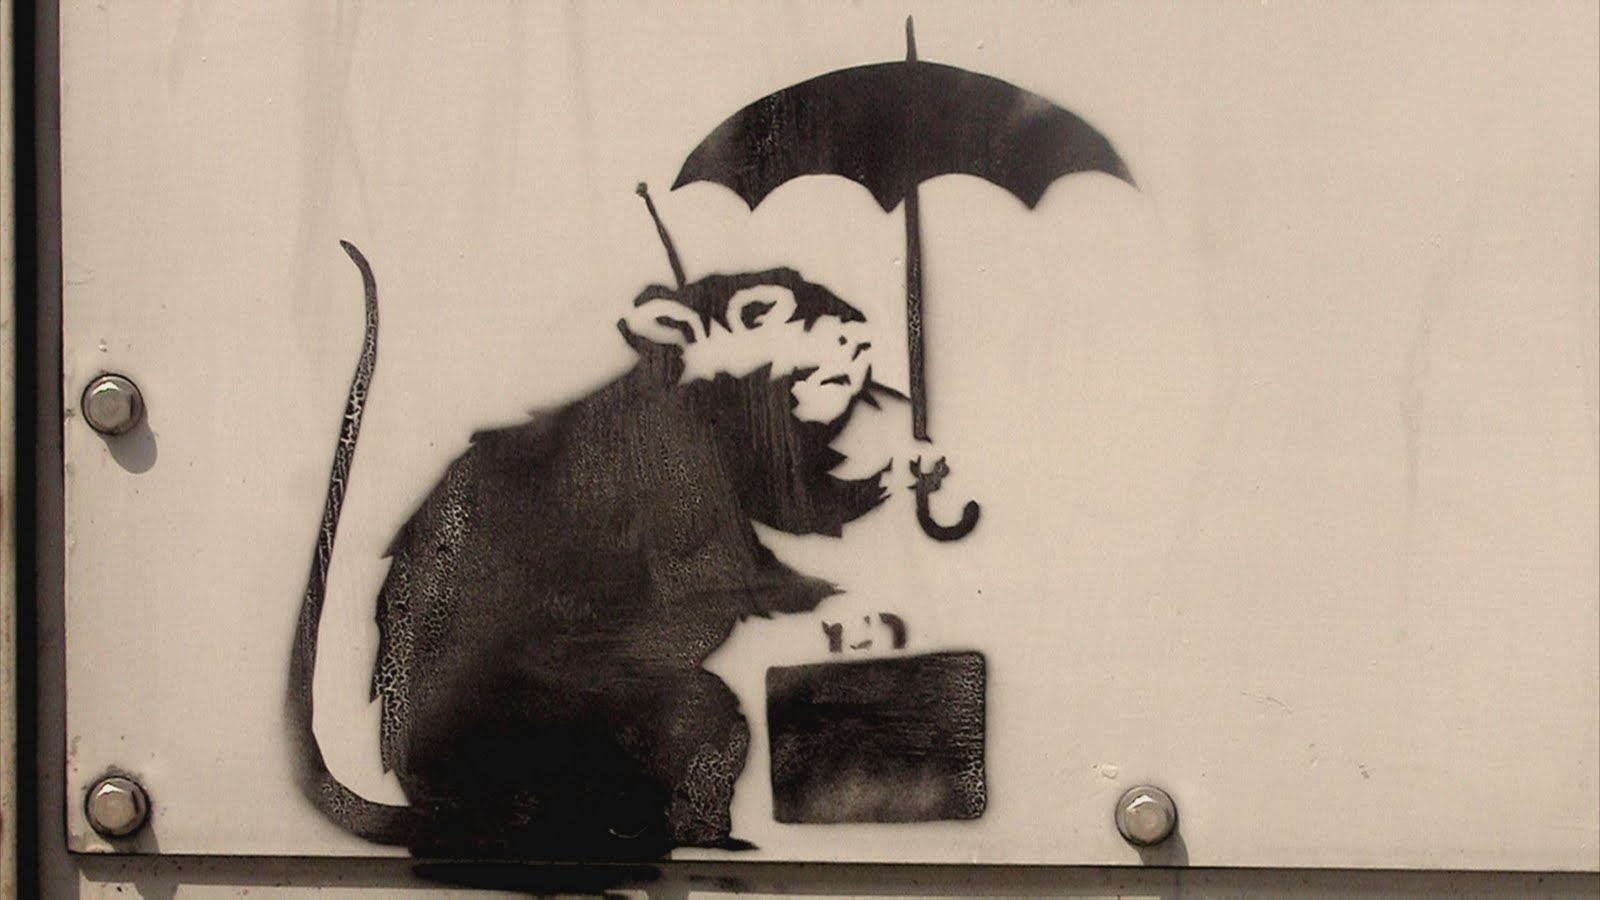 Aria 6 13 10 6 20 10 for Mural painted by street artist mr brainwash